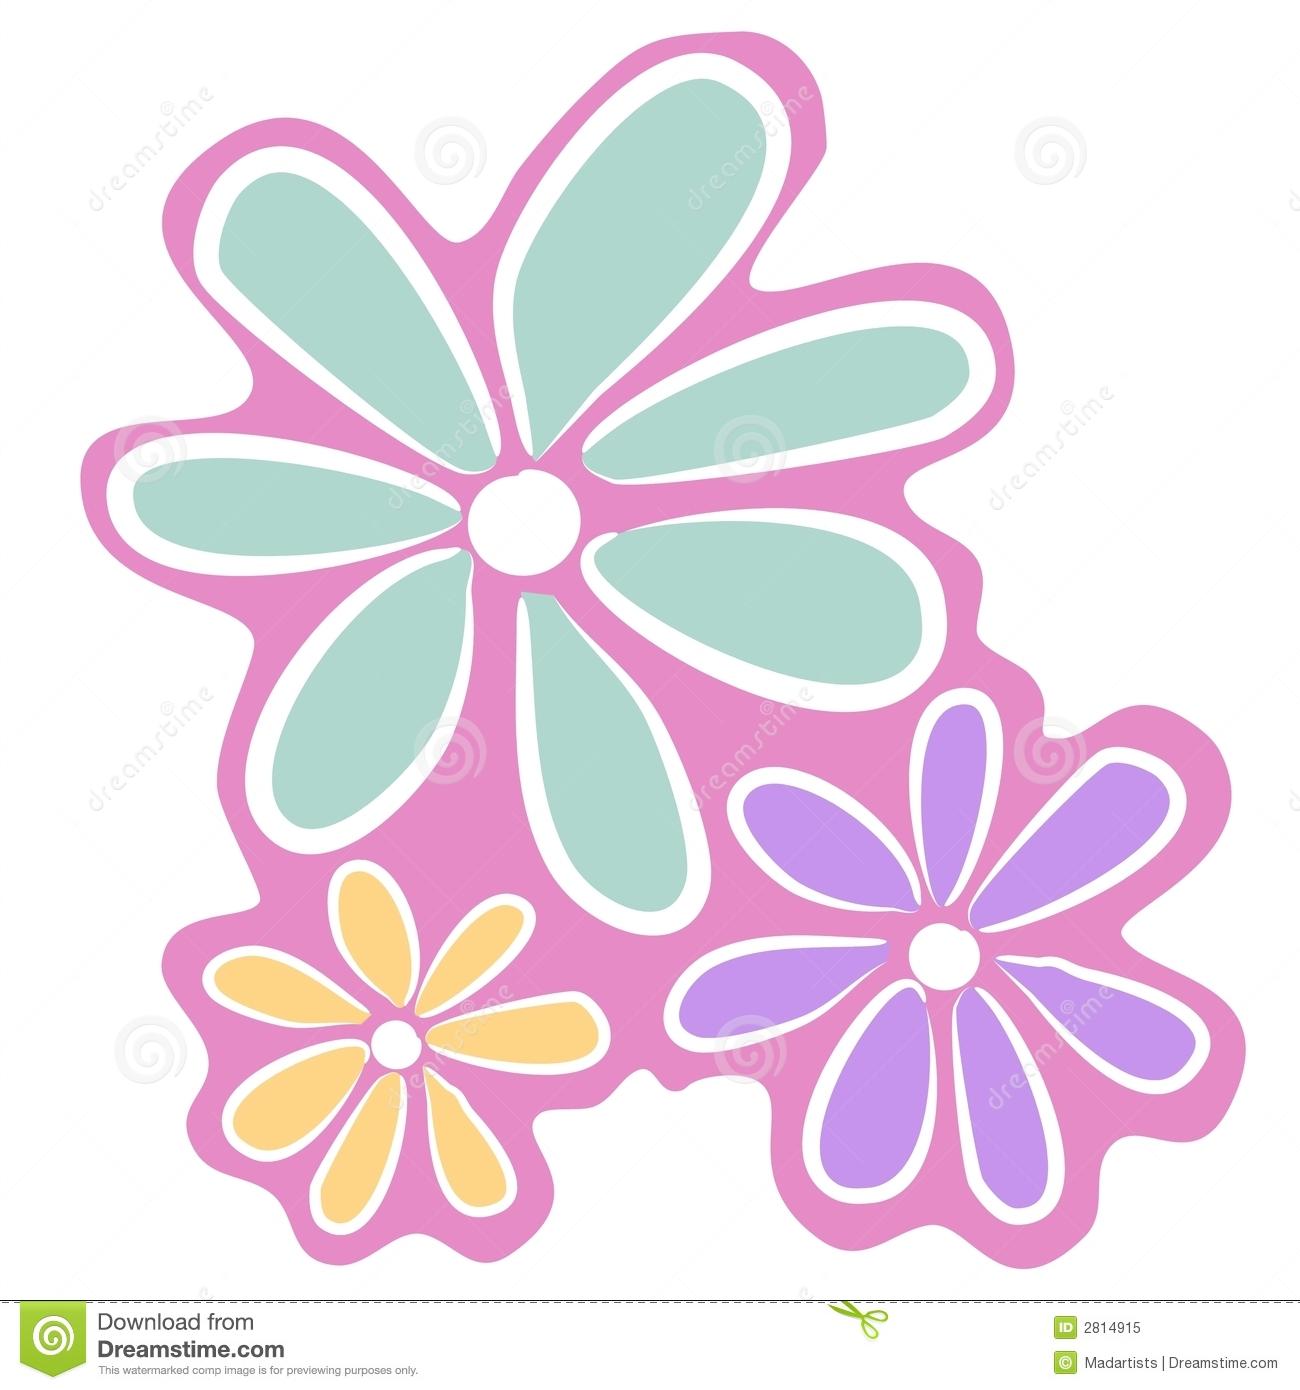 Barbie clipart flower. Light pink panda free